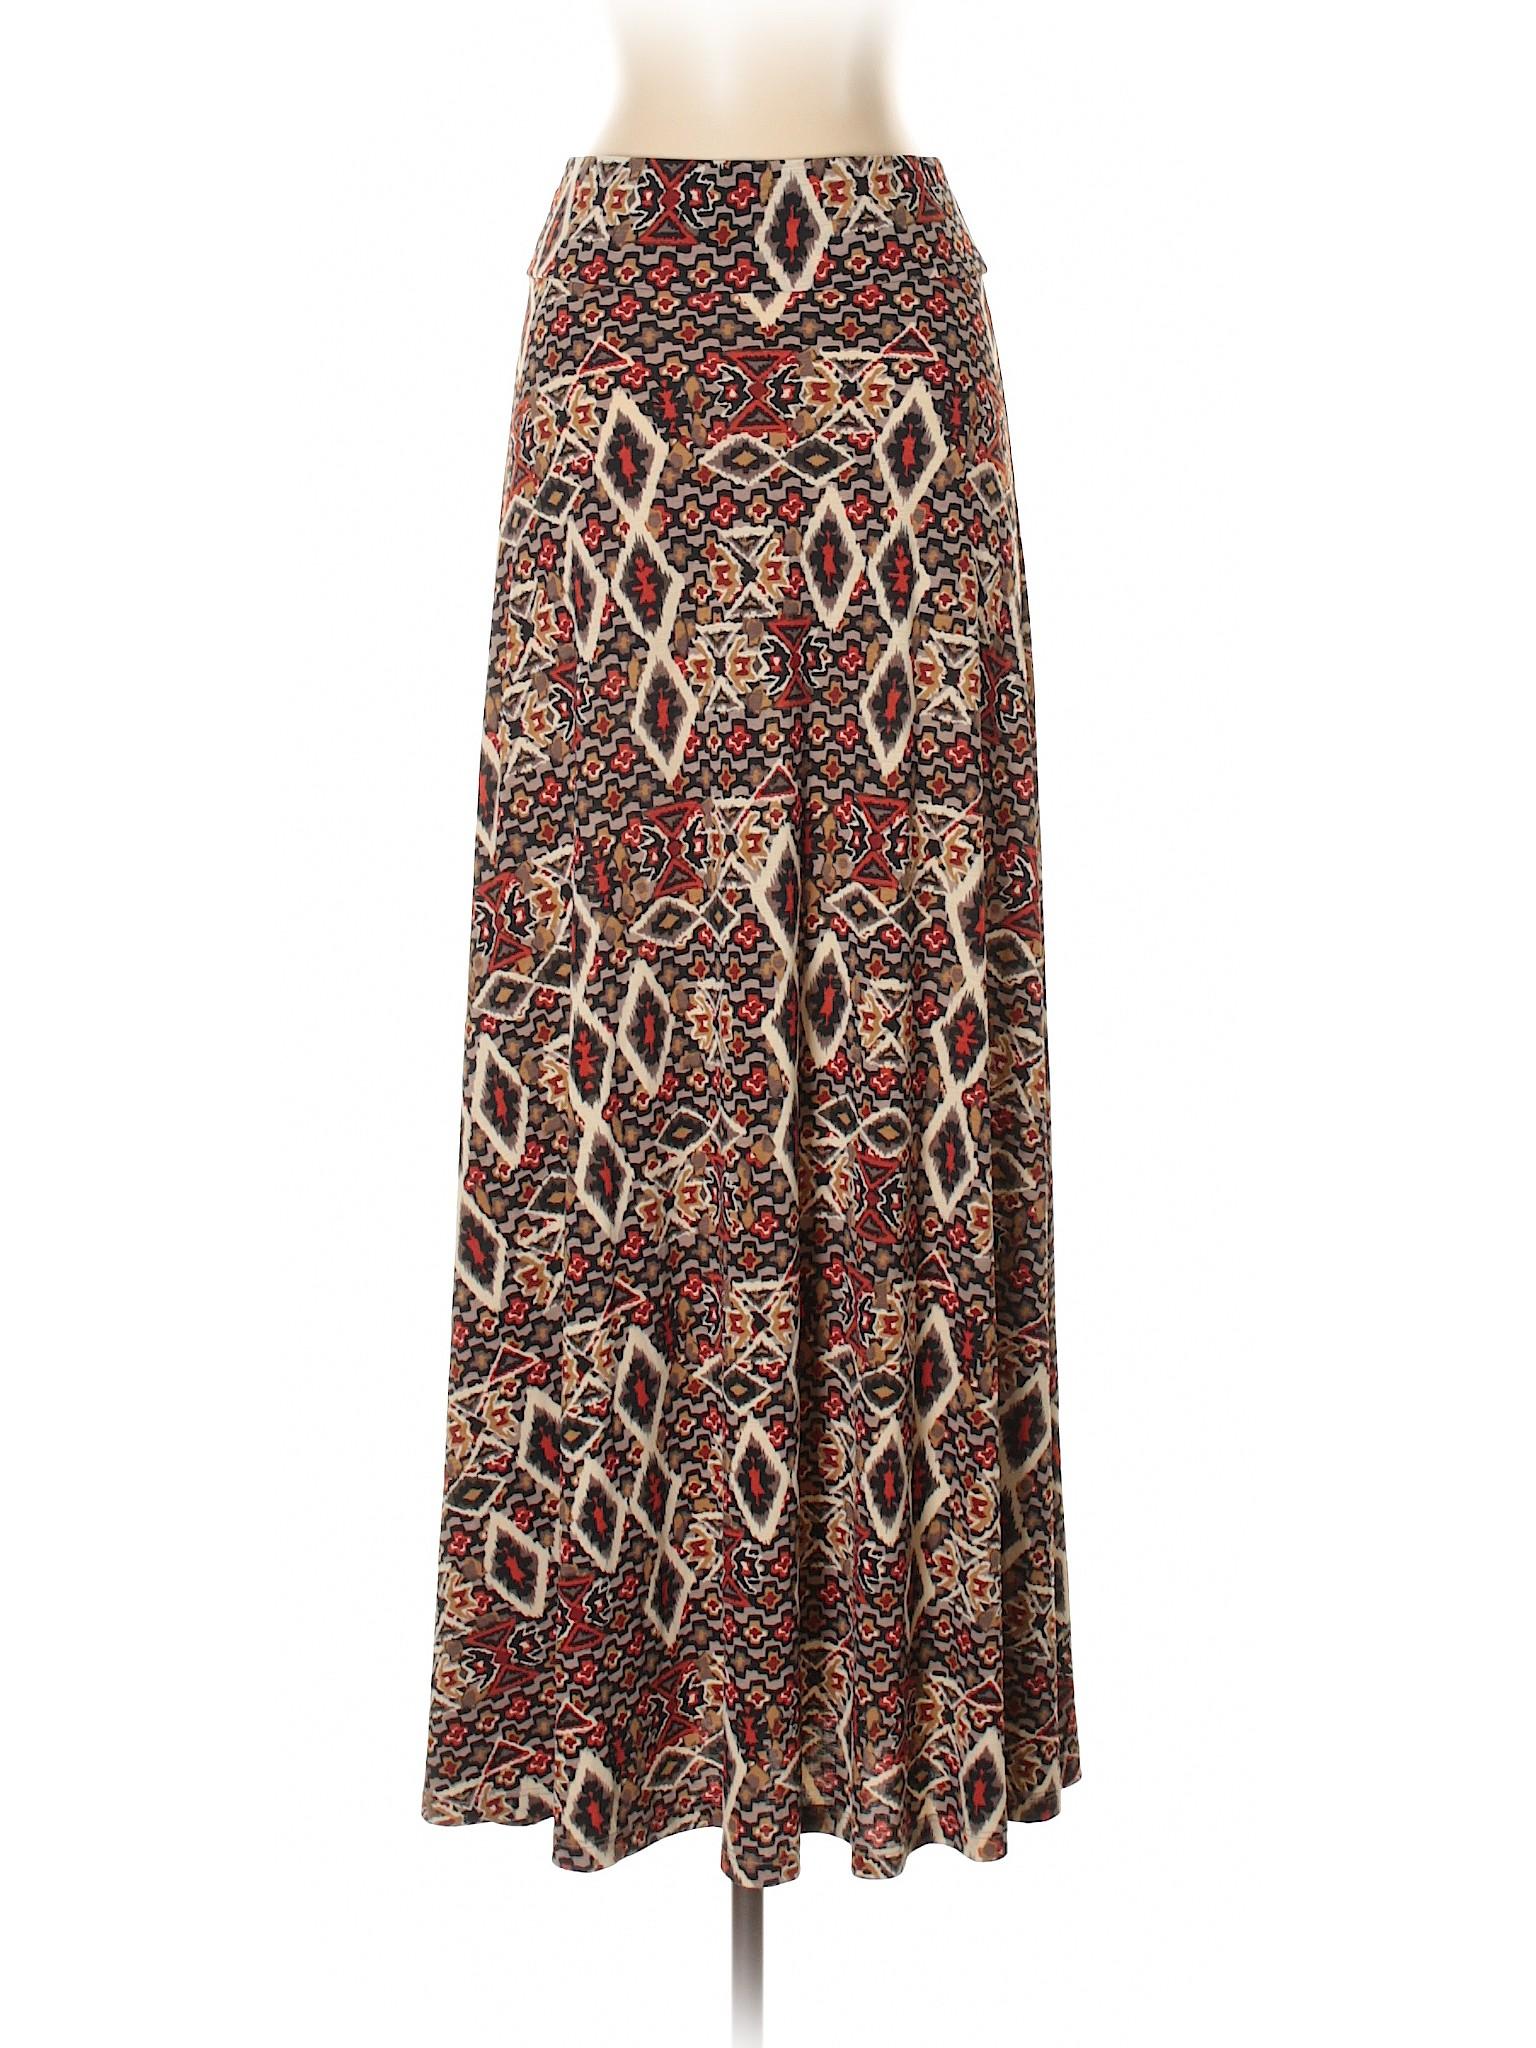 Skirt Boutique Casual Boutique Skirt Skirt Boutique Boutique Casual Casual Skirt Boutique Casual gqwrHXxg